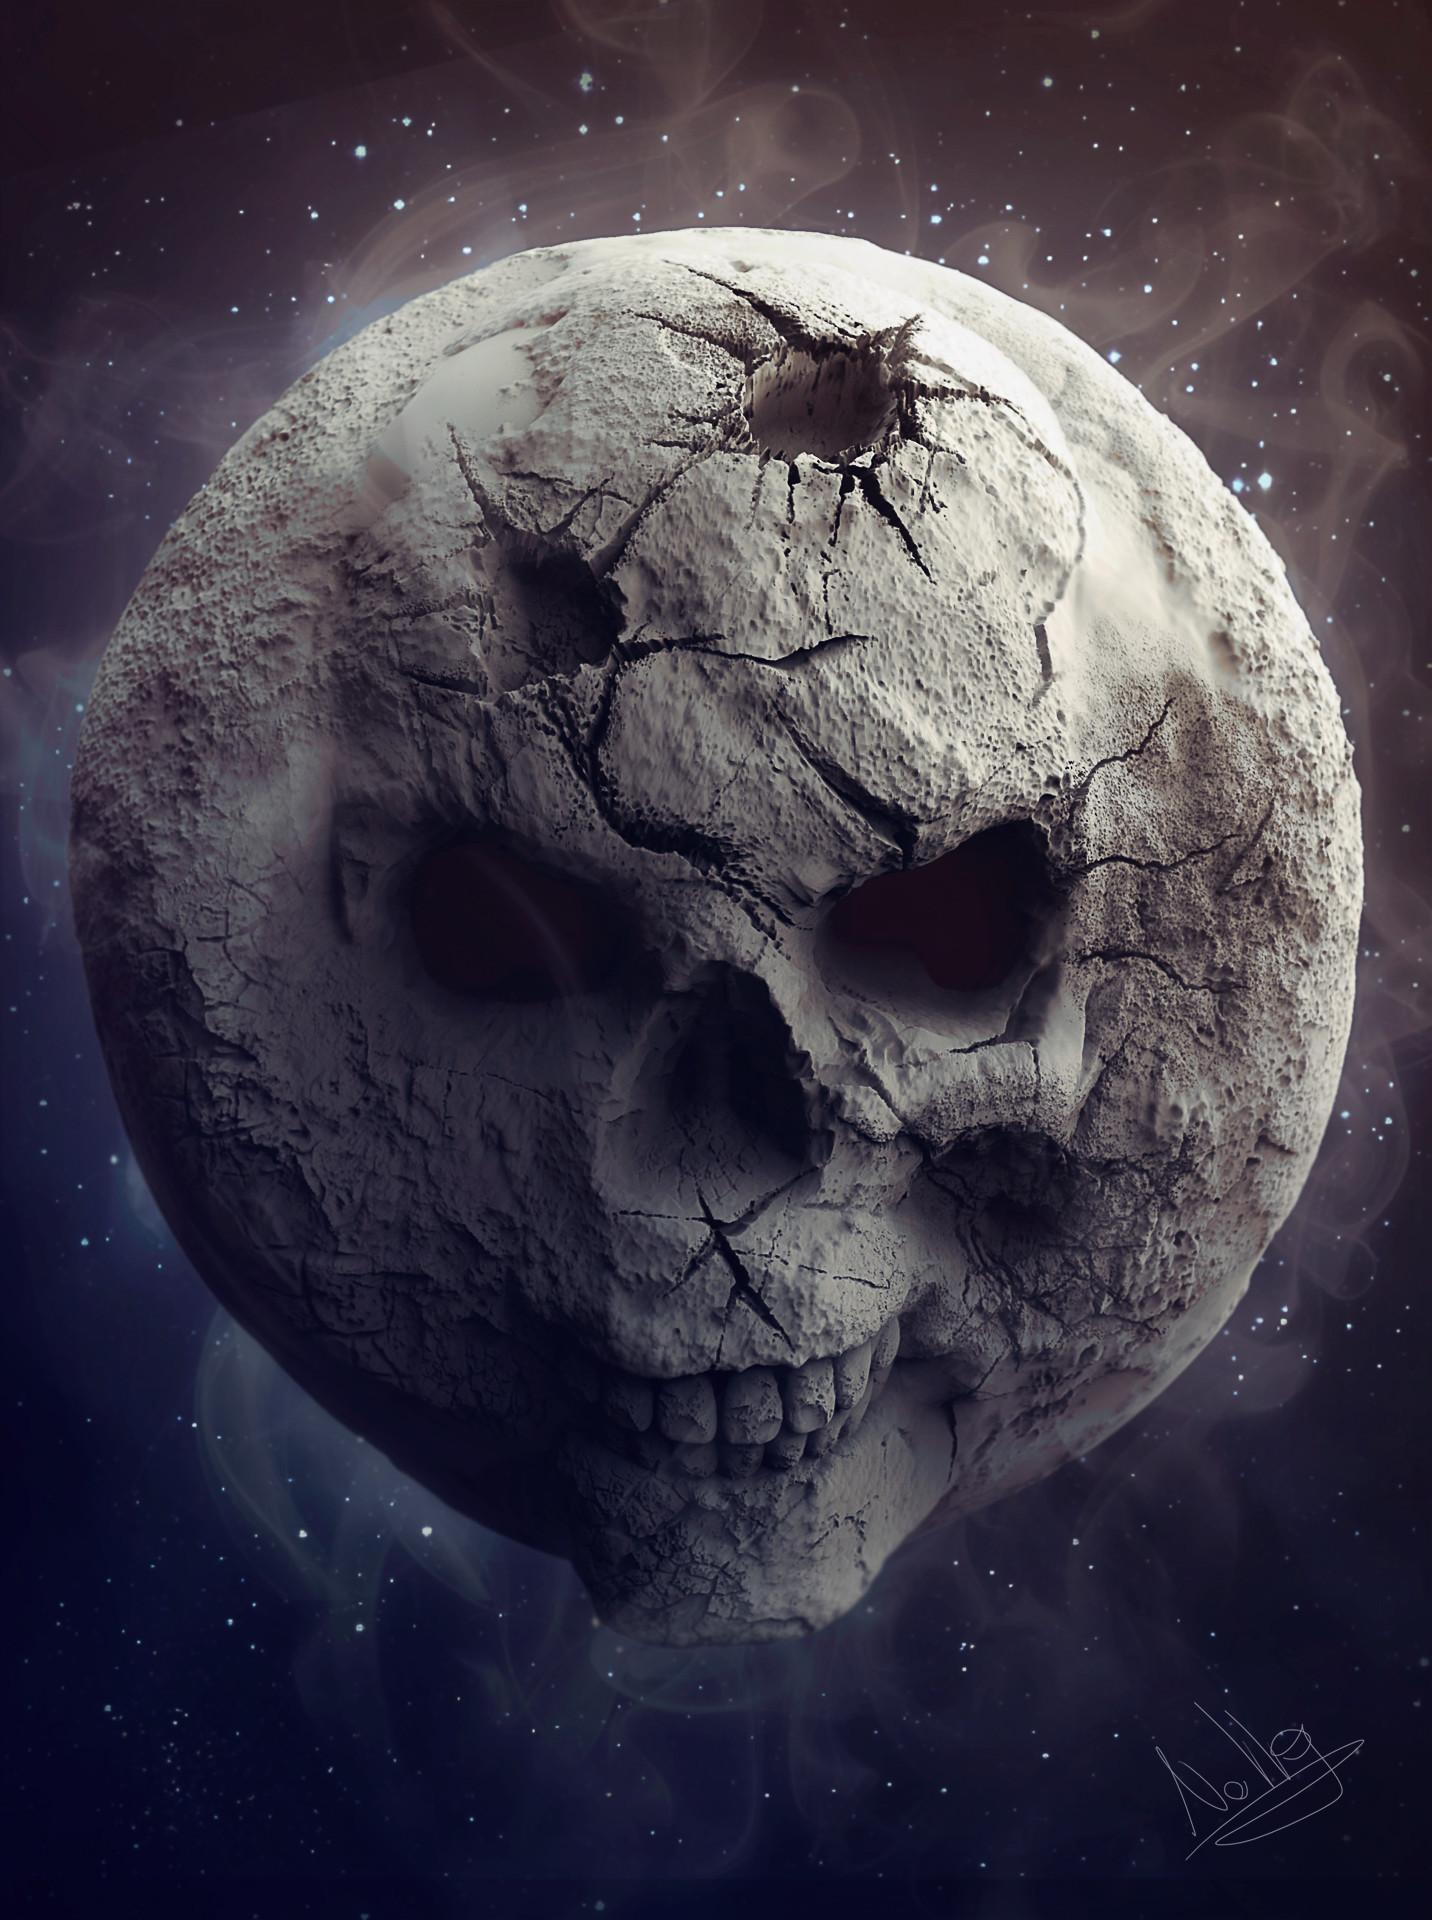 ArtStation  Skull Moon Sebastiano Di Grazia